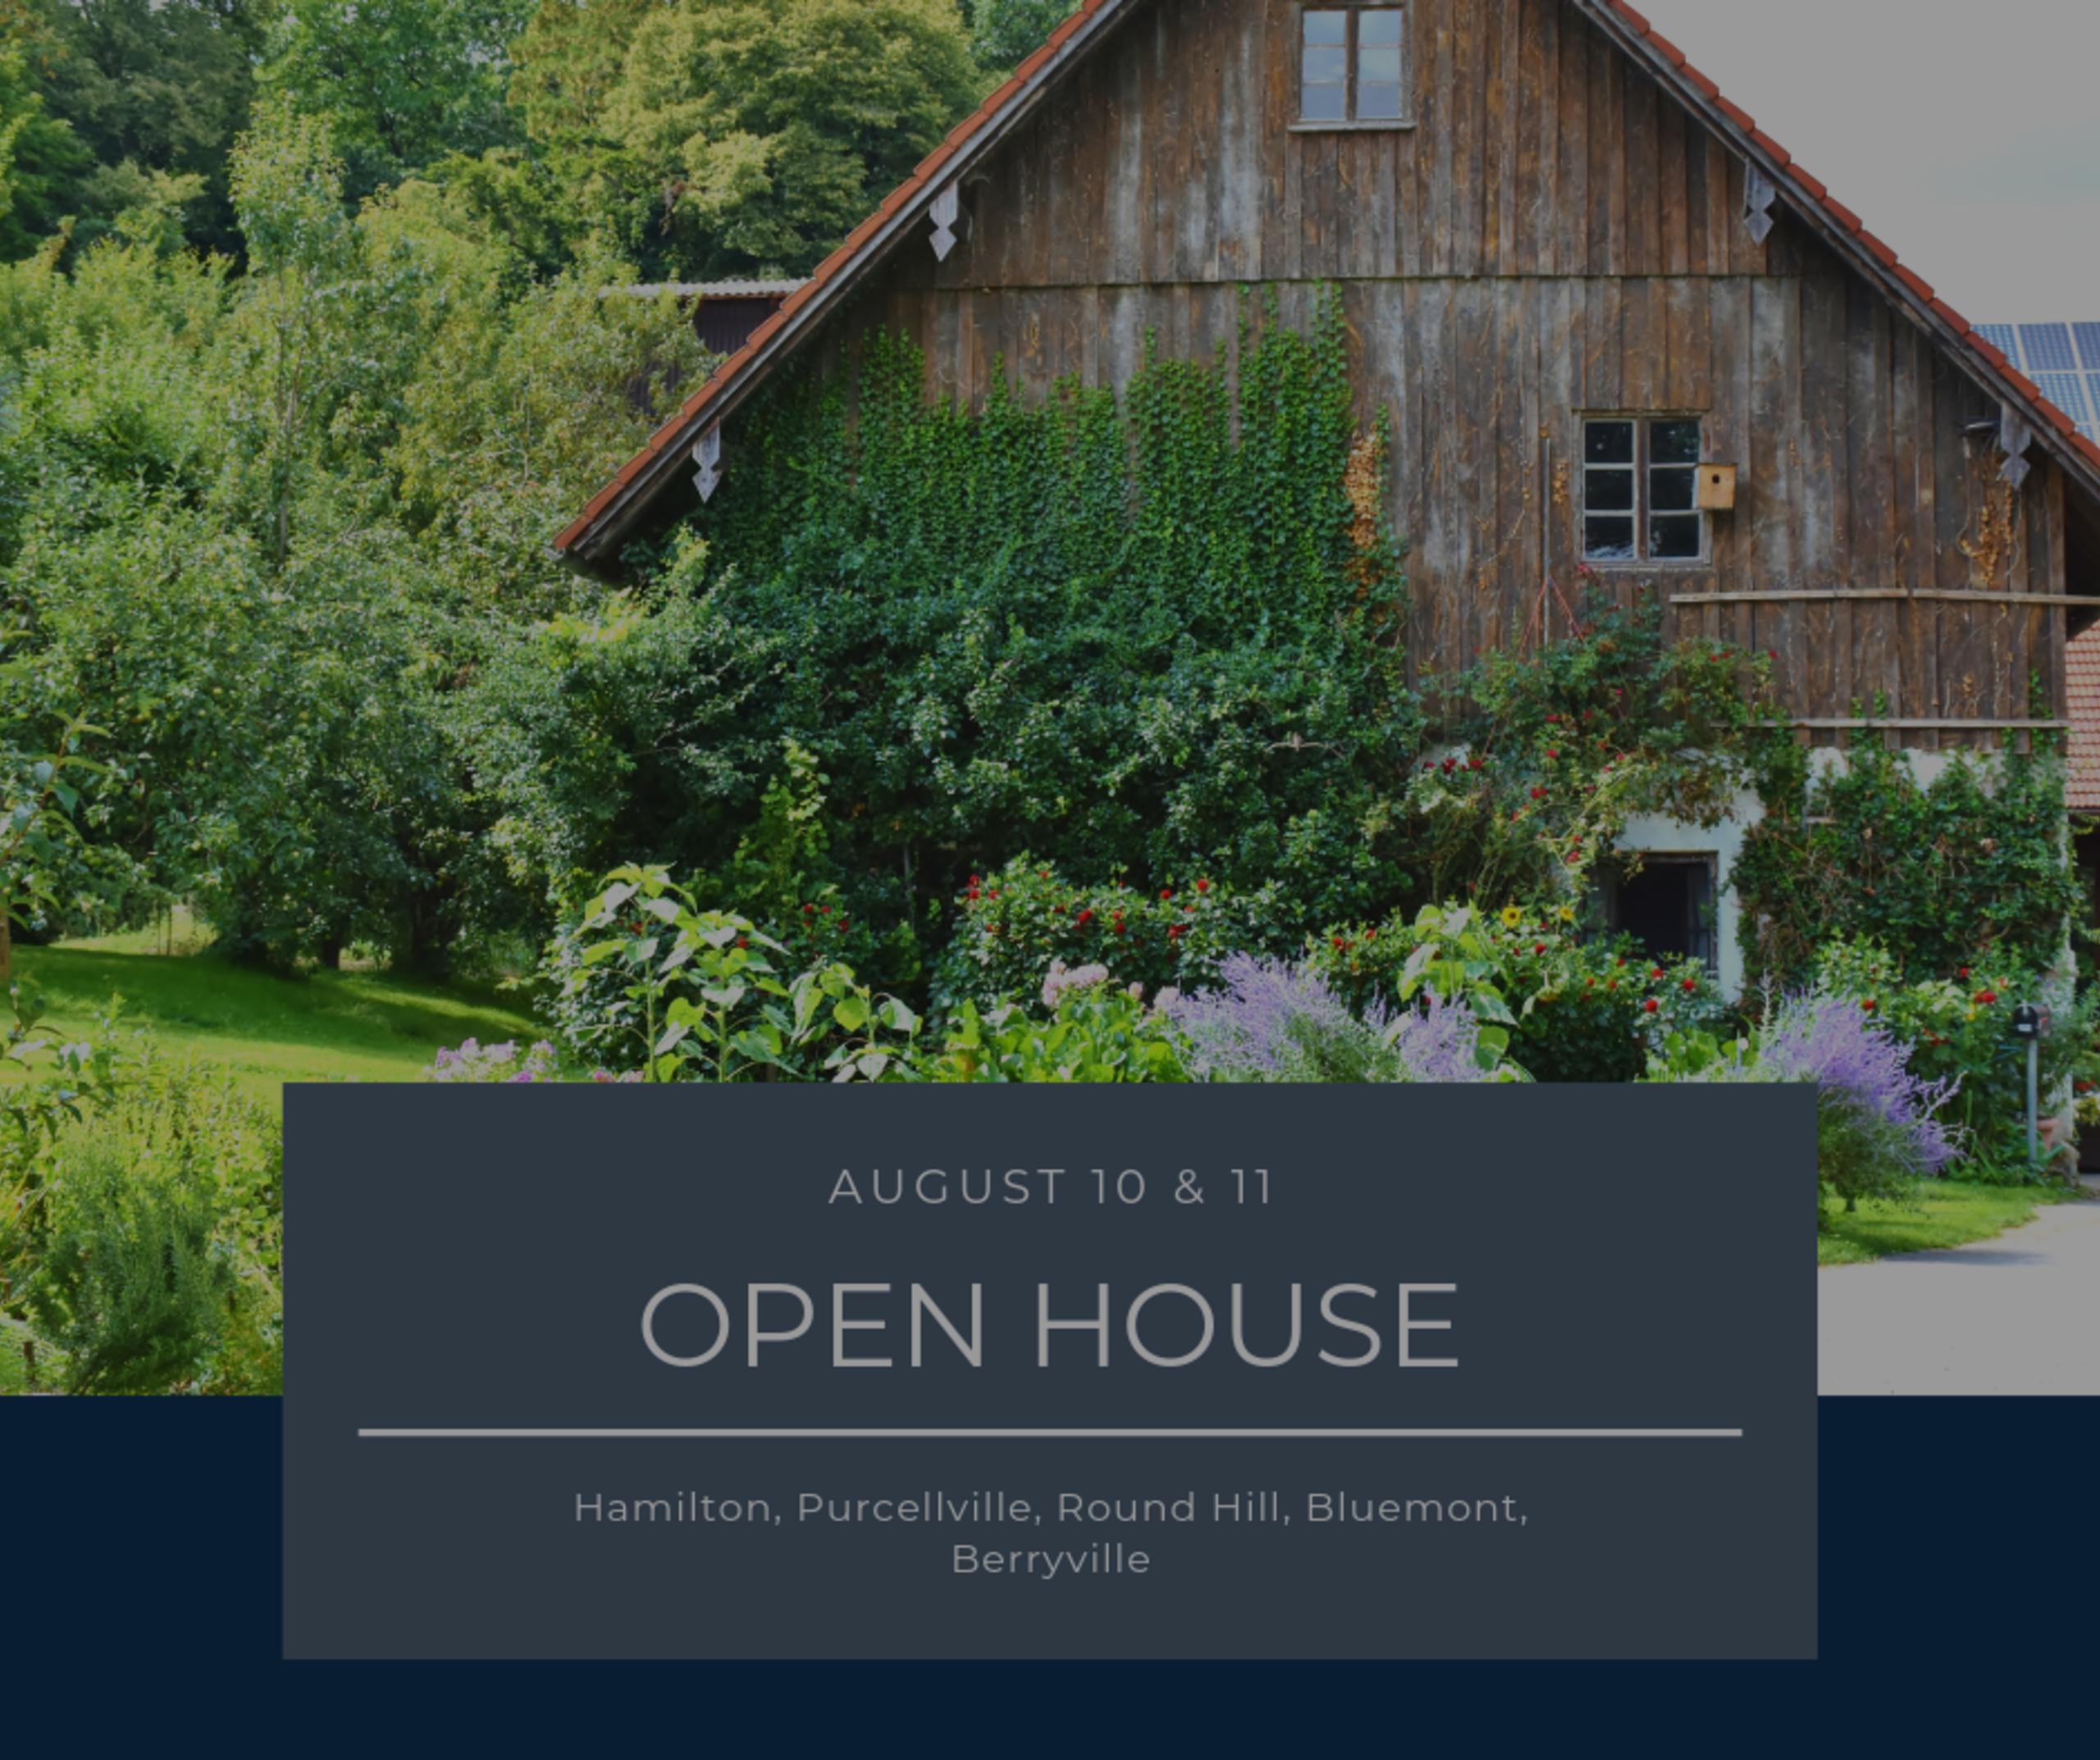 Open House List 8/10/19 – 8/11/19